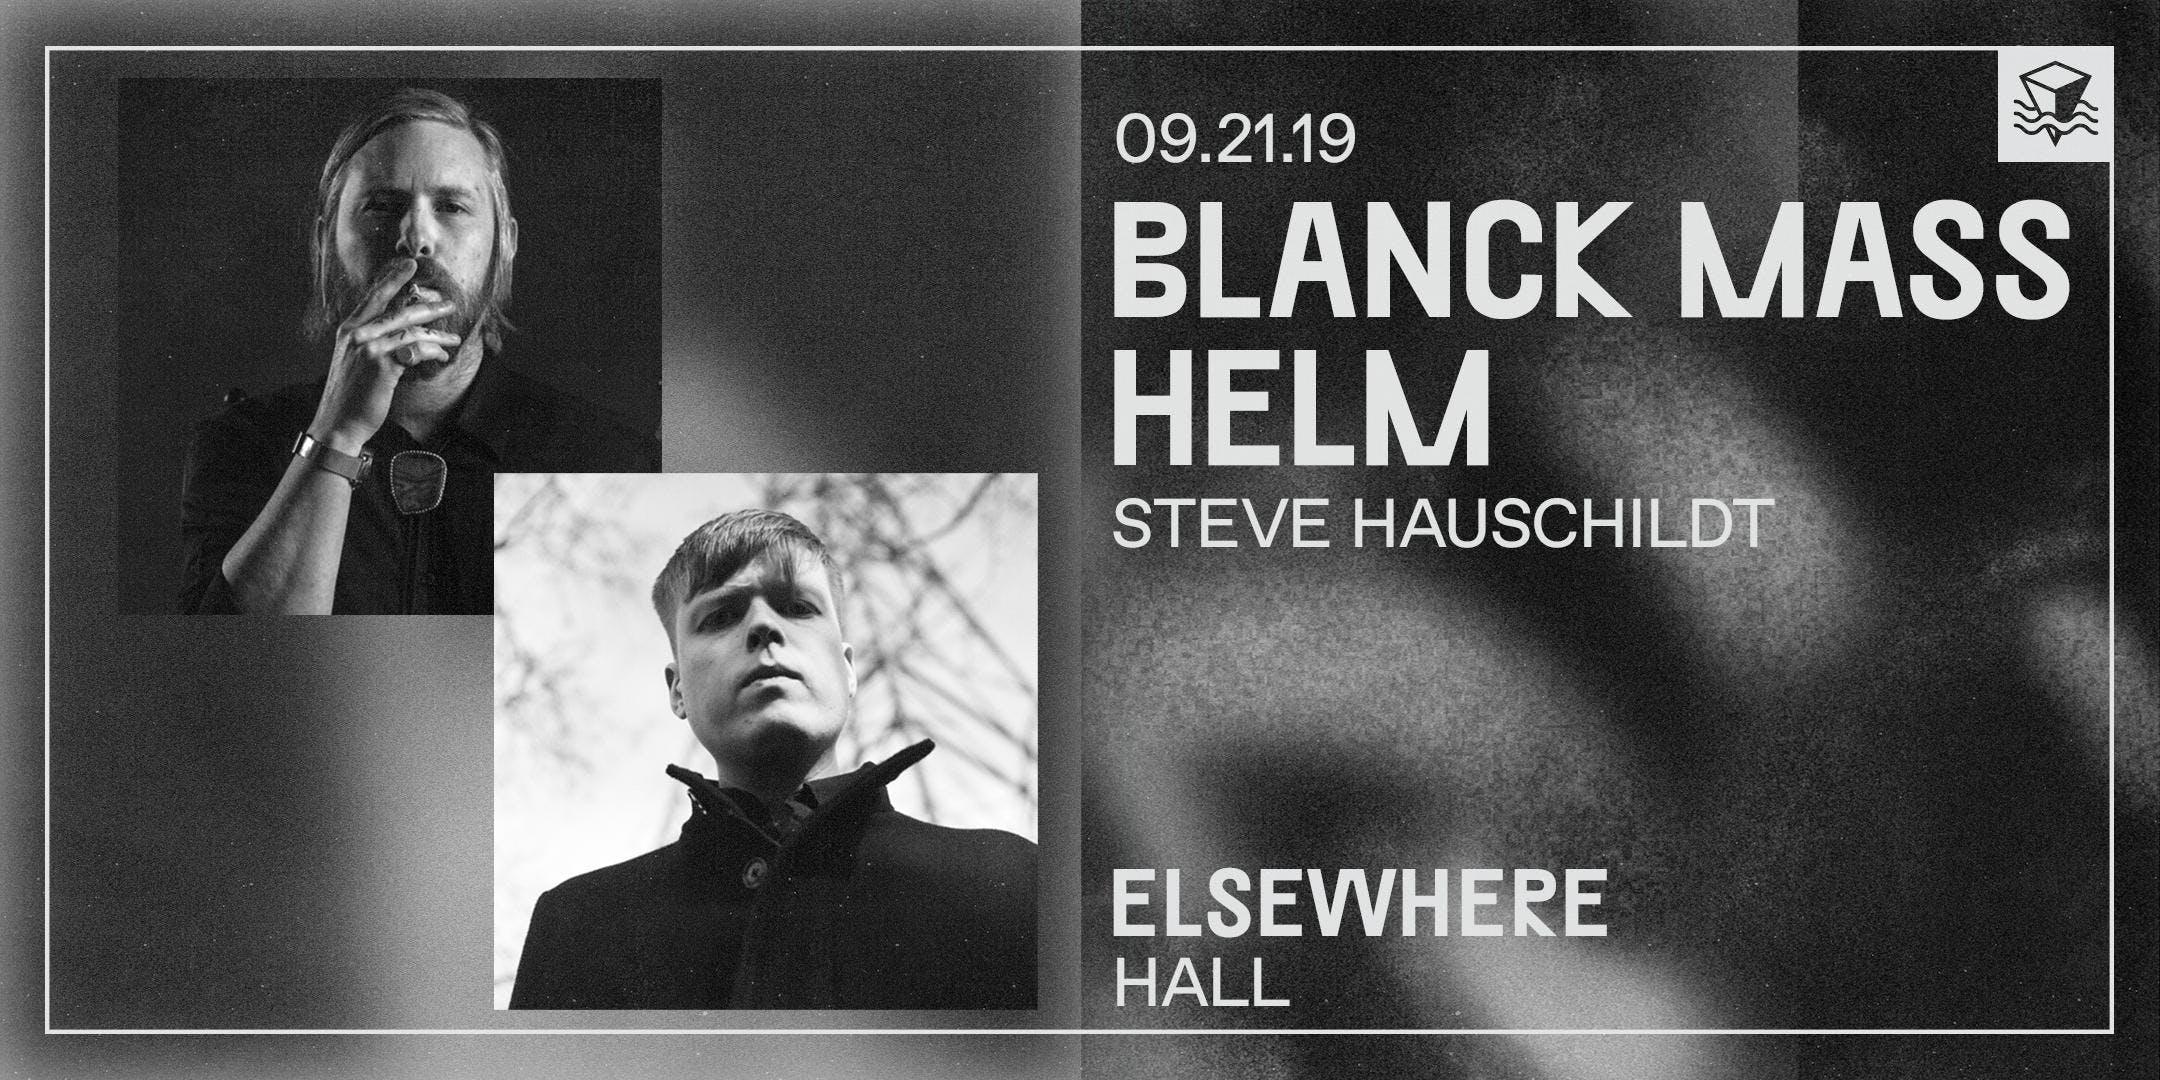 Blanck Mass + Helm